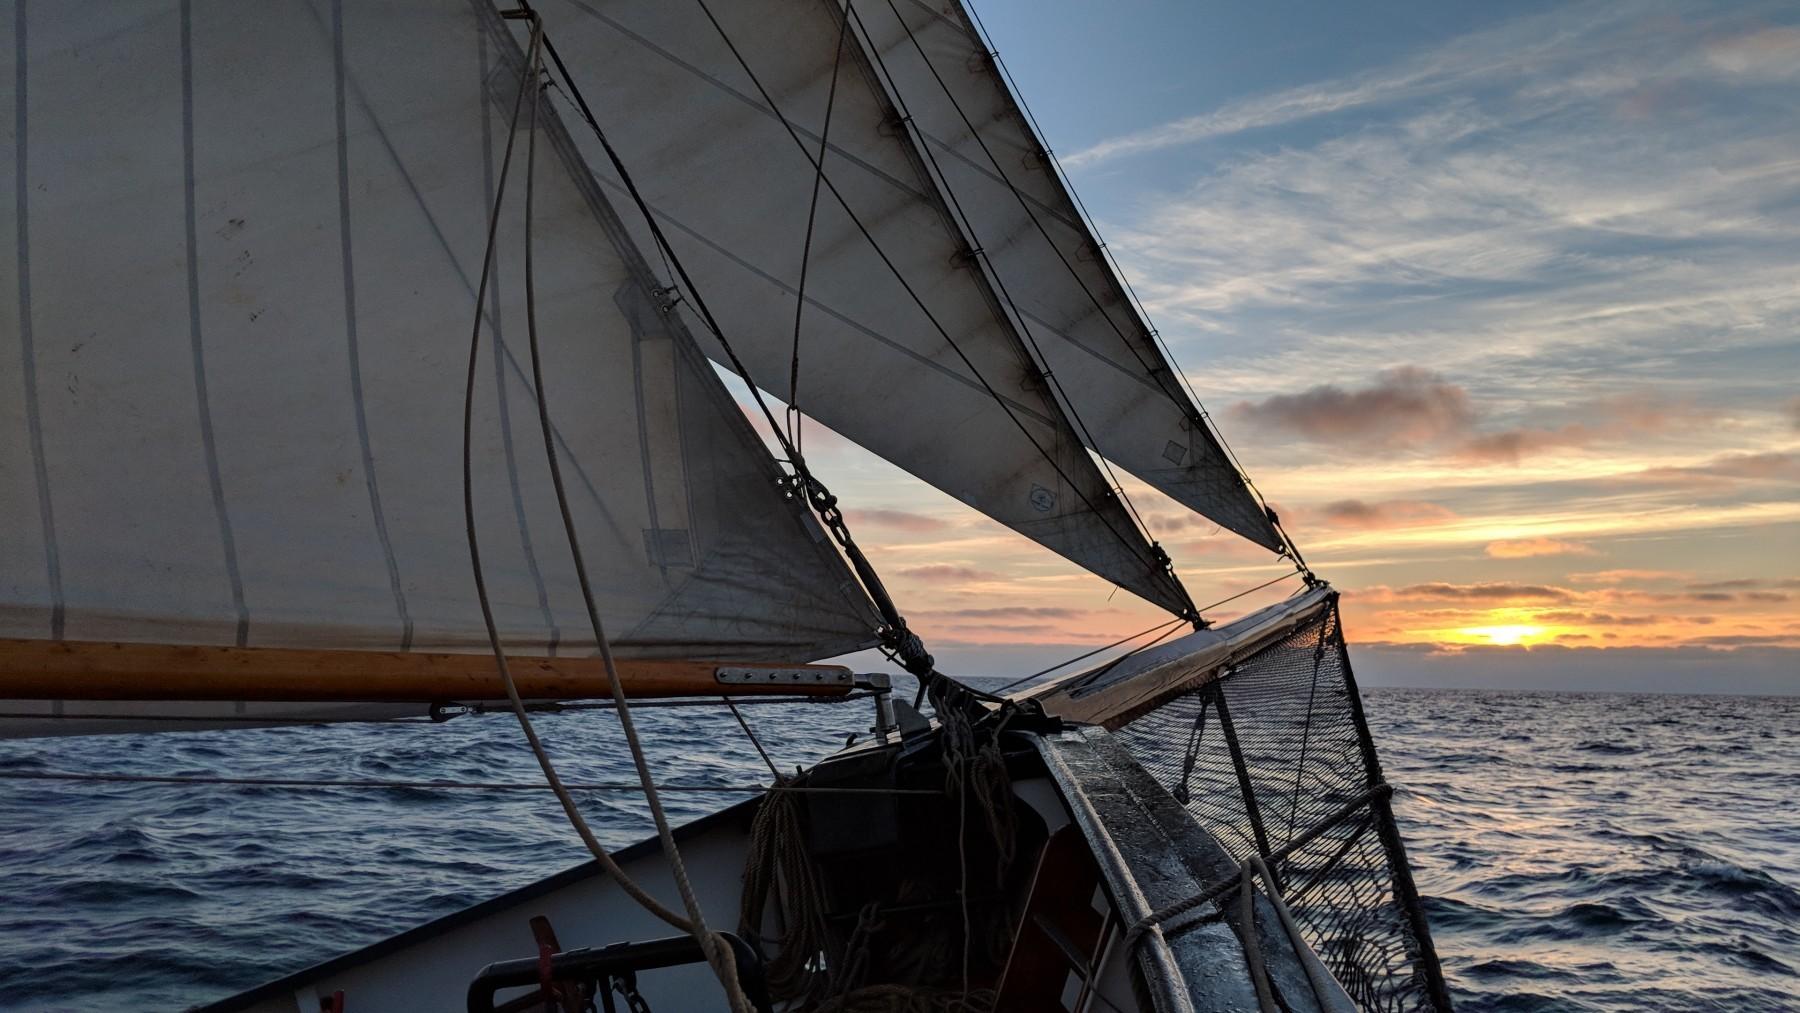 Wochenende segeln ABEL TASMAN